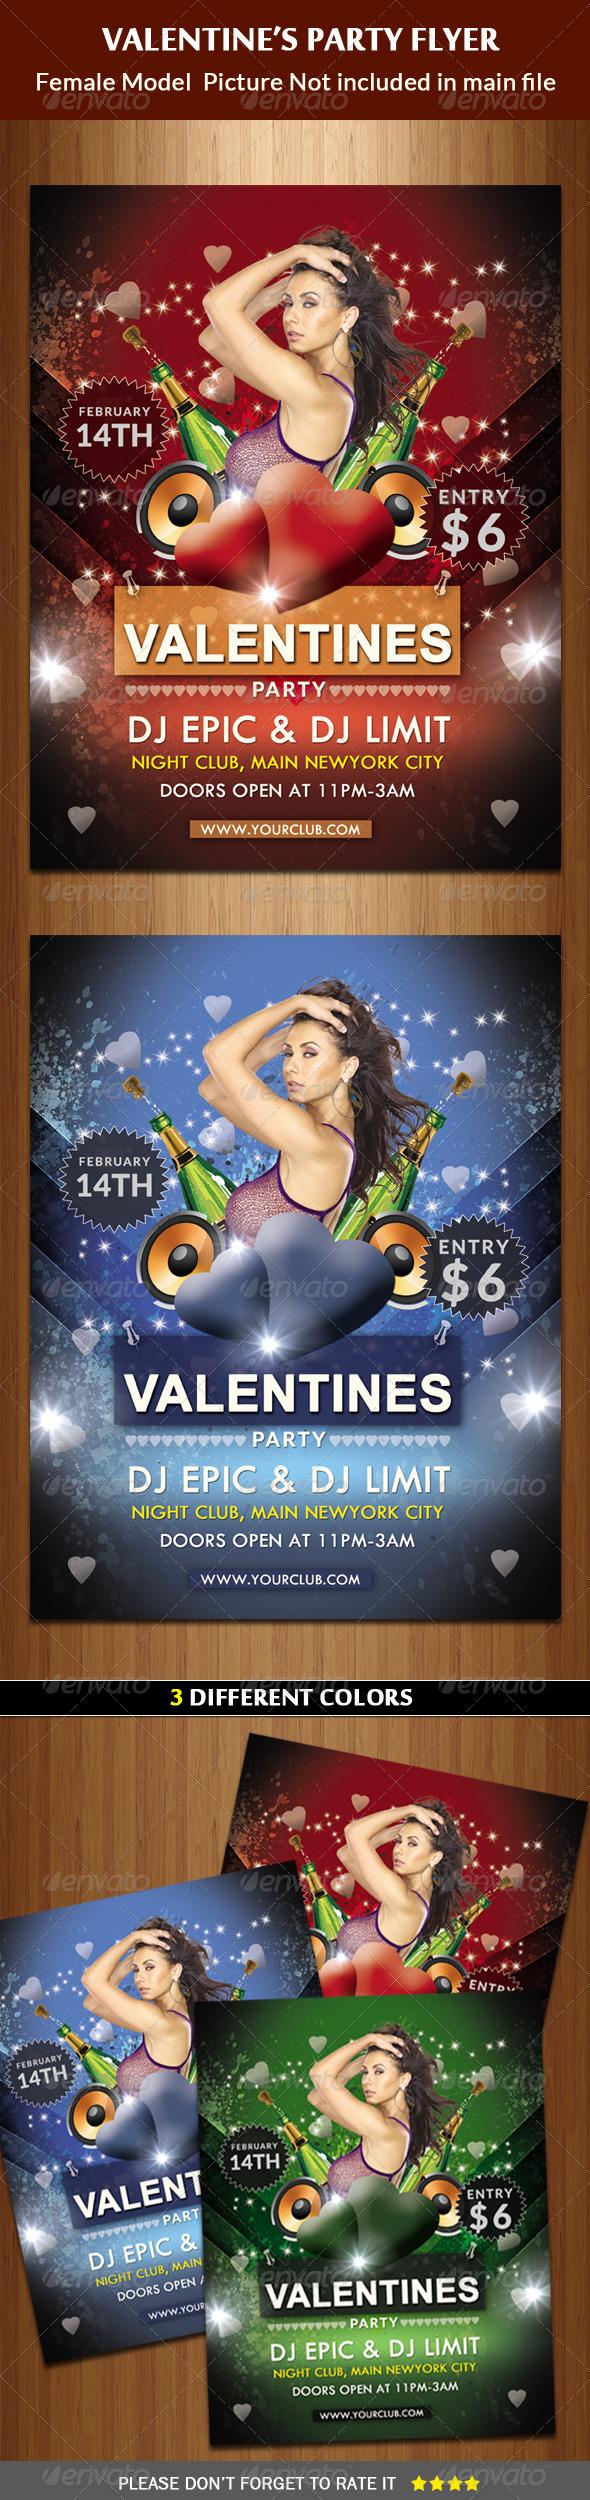 GraphicRiver Valentine Party Flyer 6436585